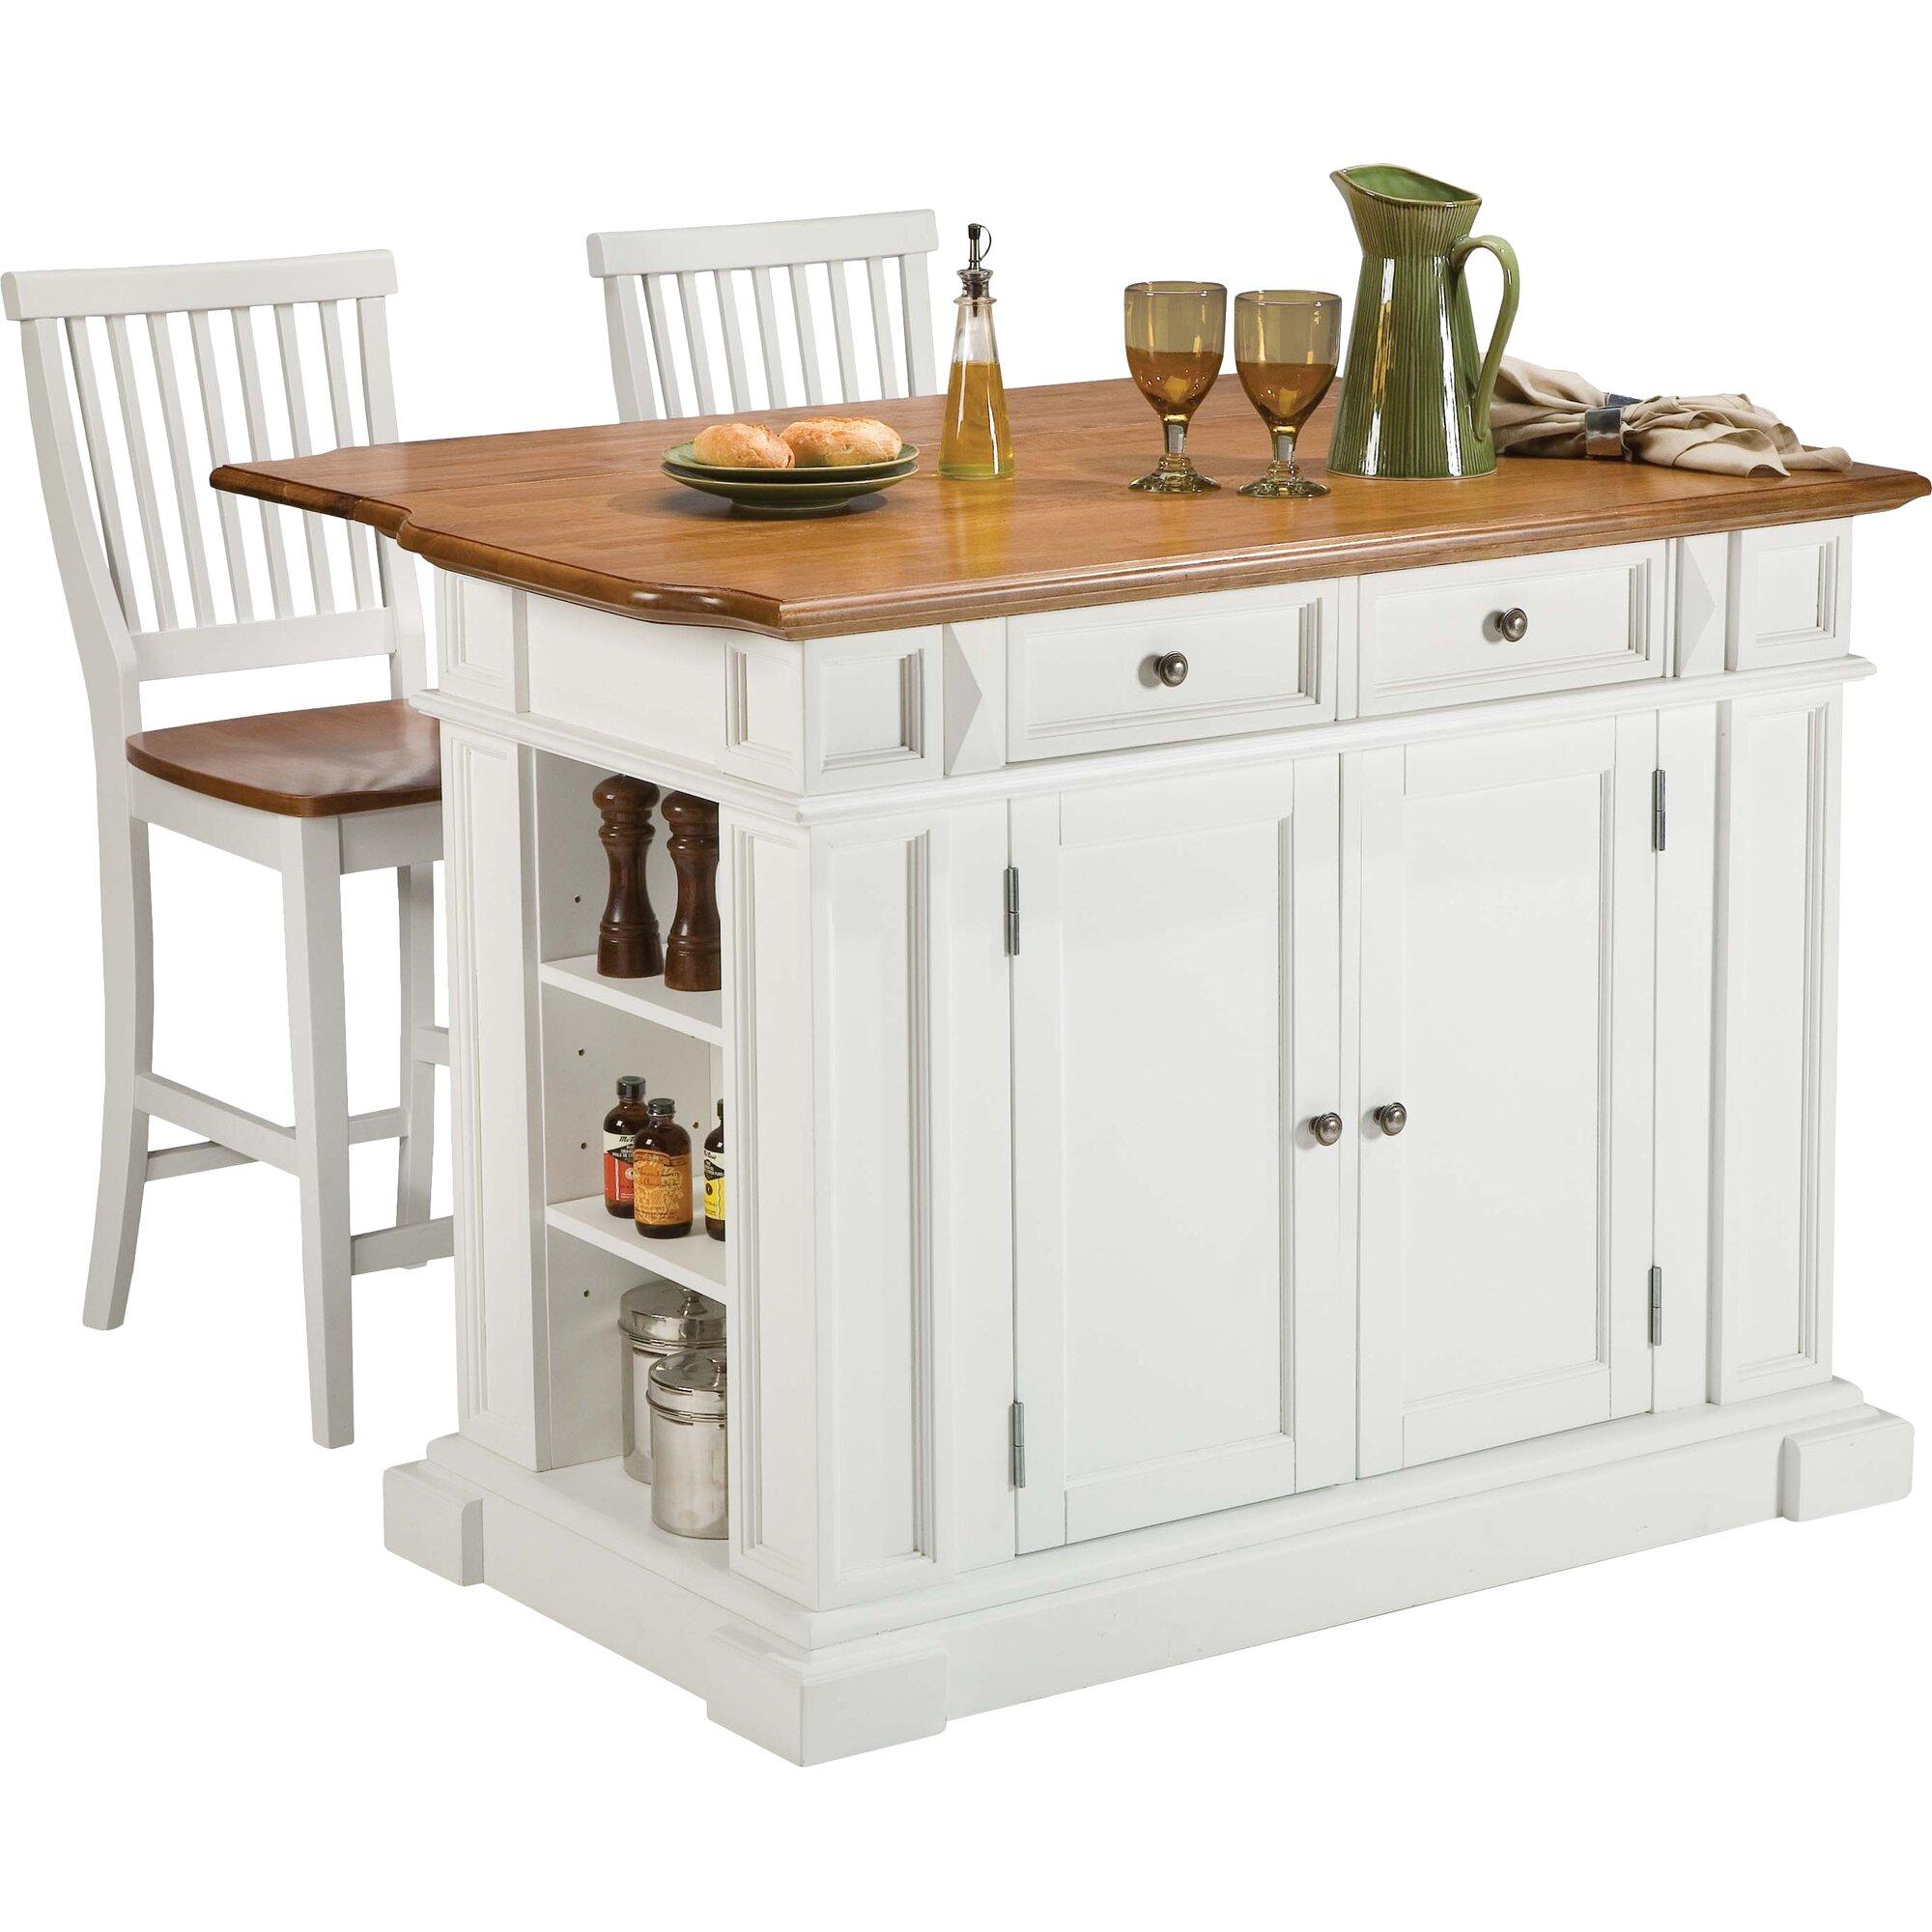 Darby Home Co Mattice 3 Piece Kitchen Island Set & Reviews